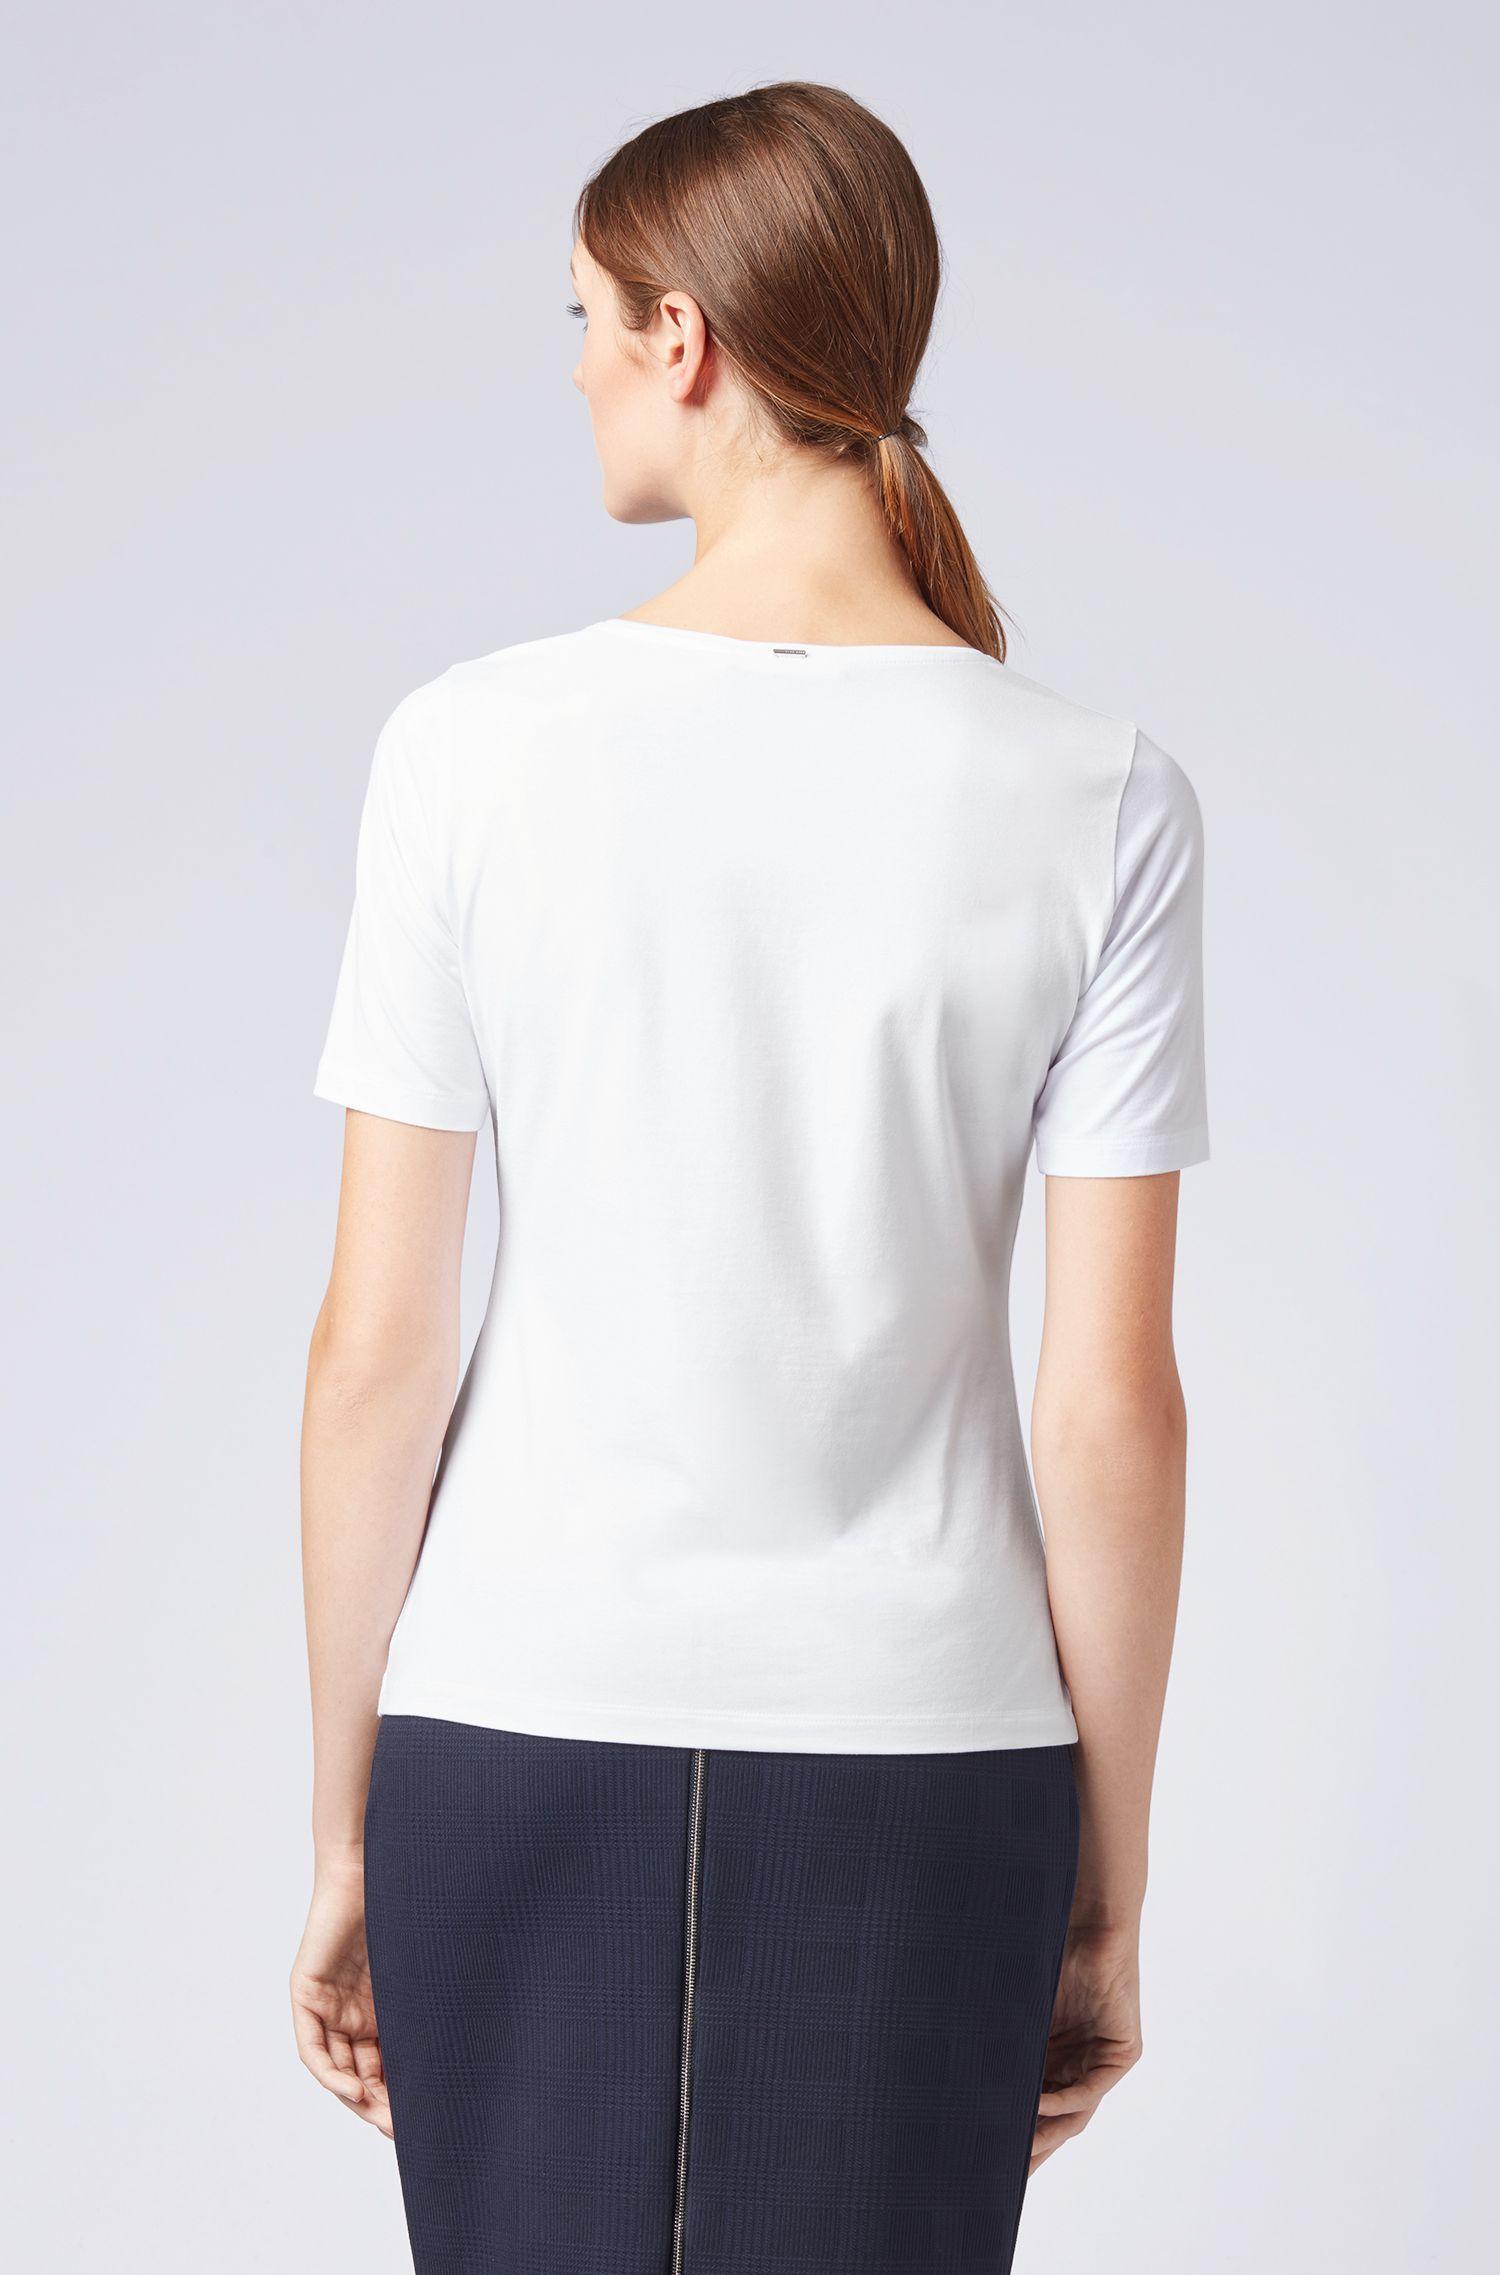 Jersey-Top mit Seidenbesatz am Ausschnitt, Weiß